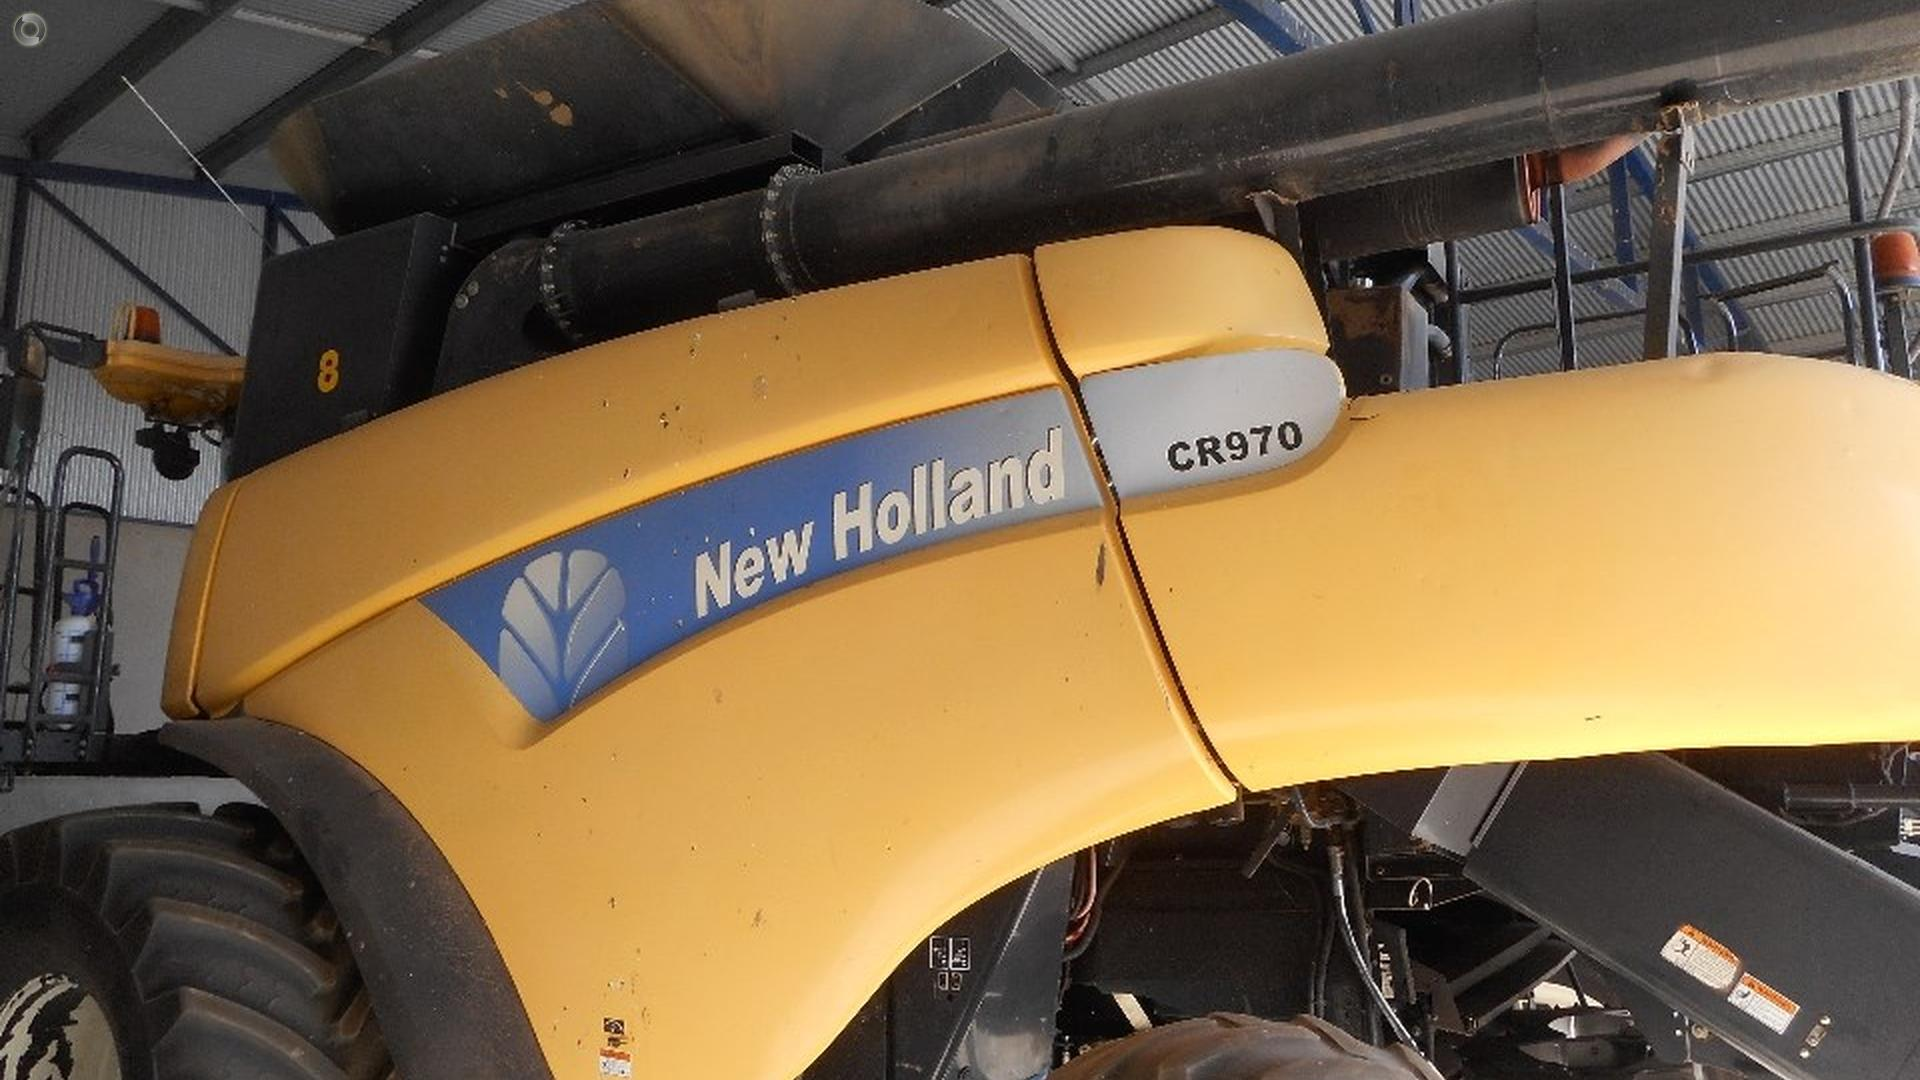 2005 New Holland CR970 Combine Harvester